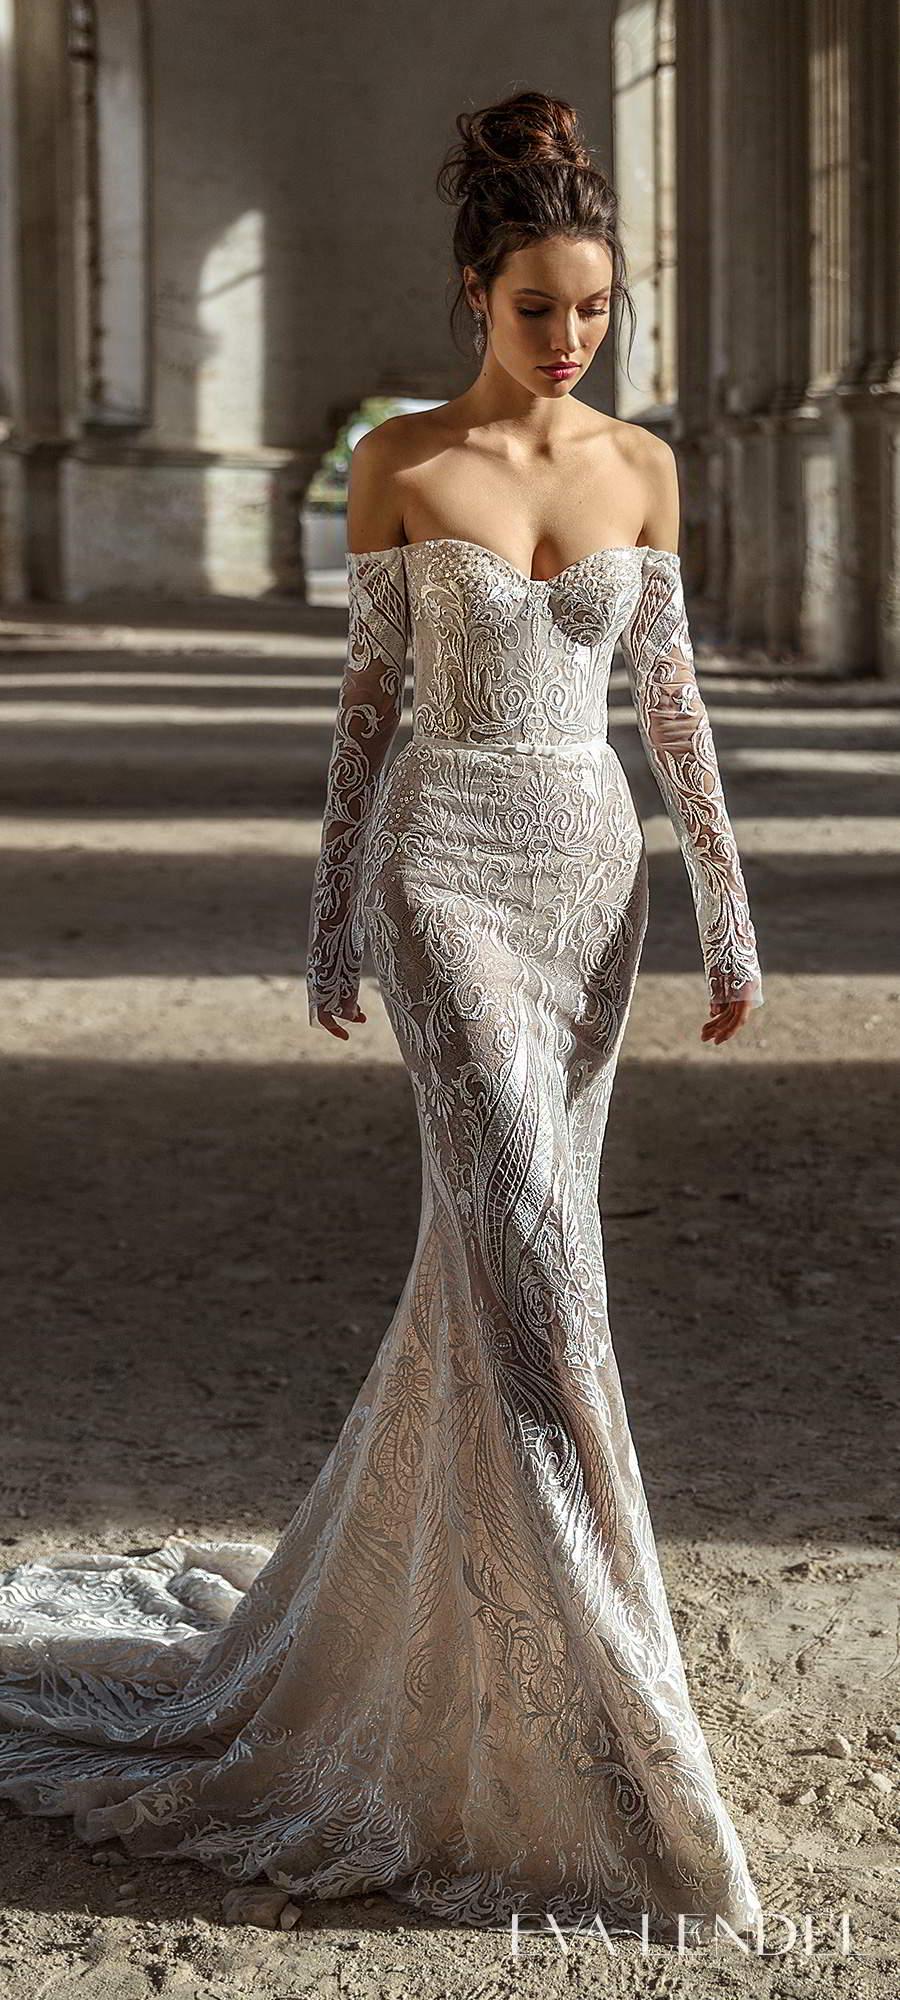 eva lendel 2021 golden hour bridal detached long sleeves sweetheart neckline fully embellished sheath wedding dress chapel train (madlen) mv